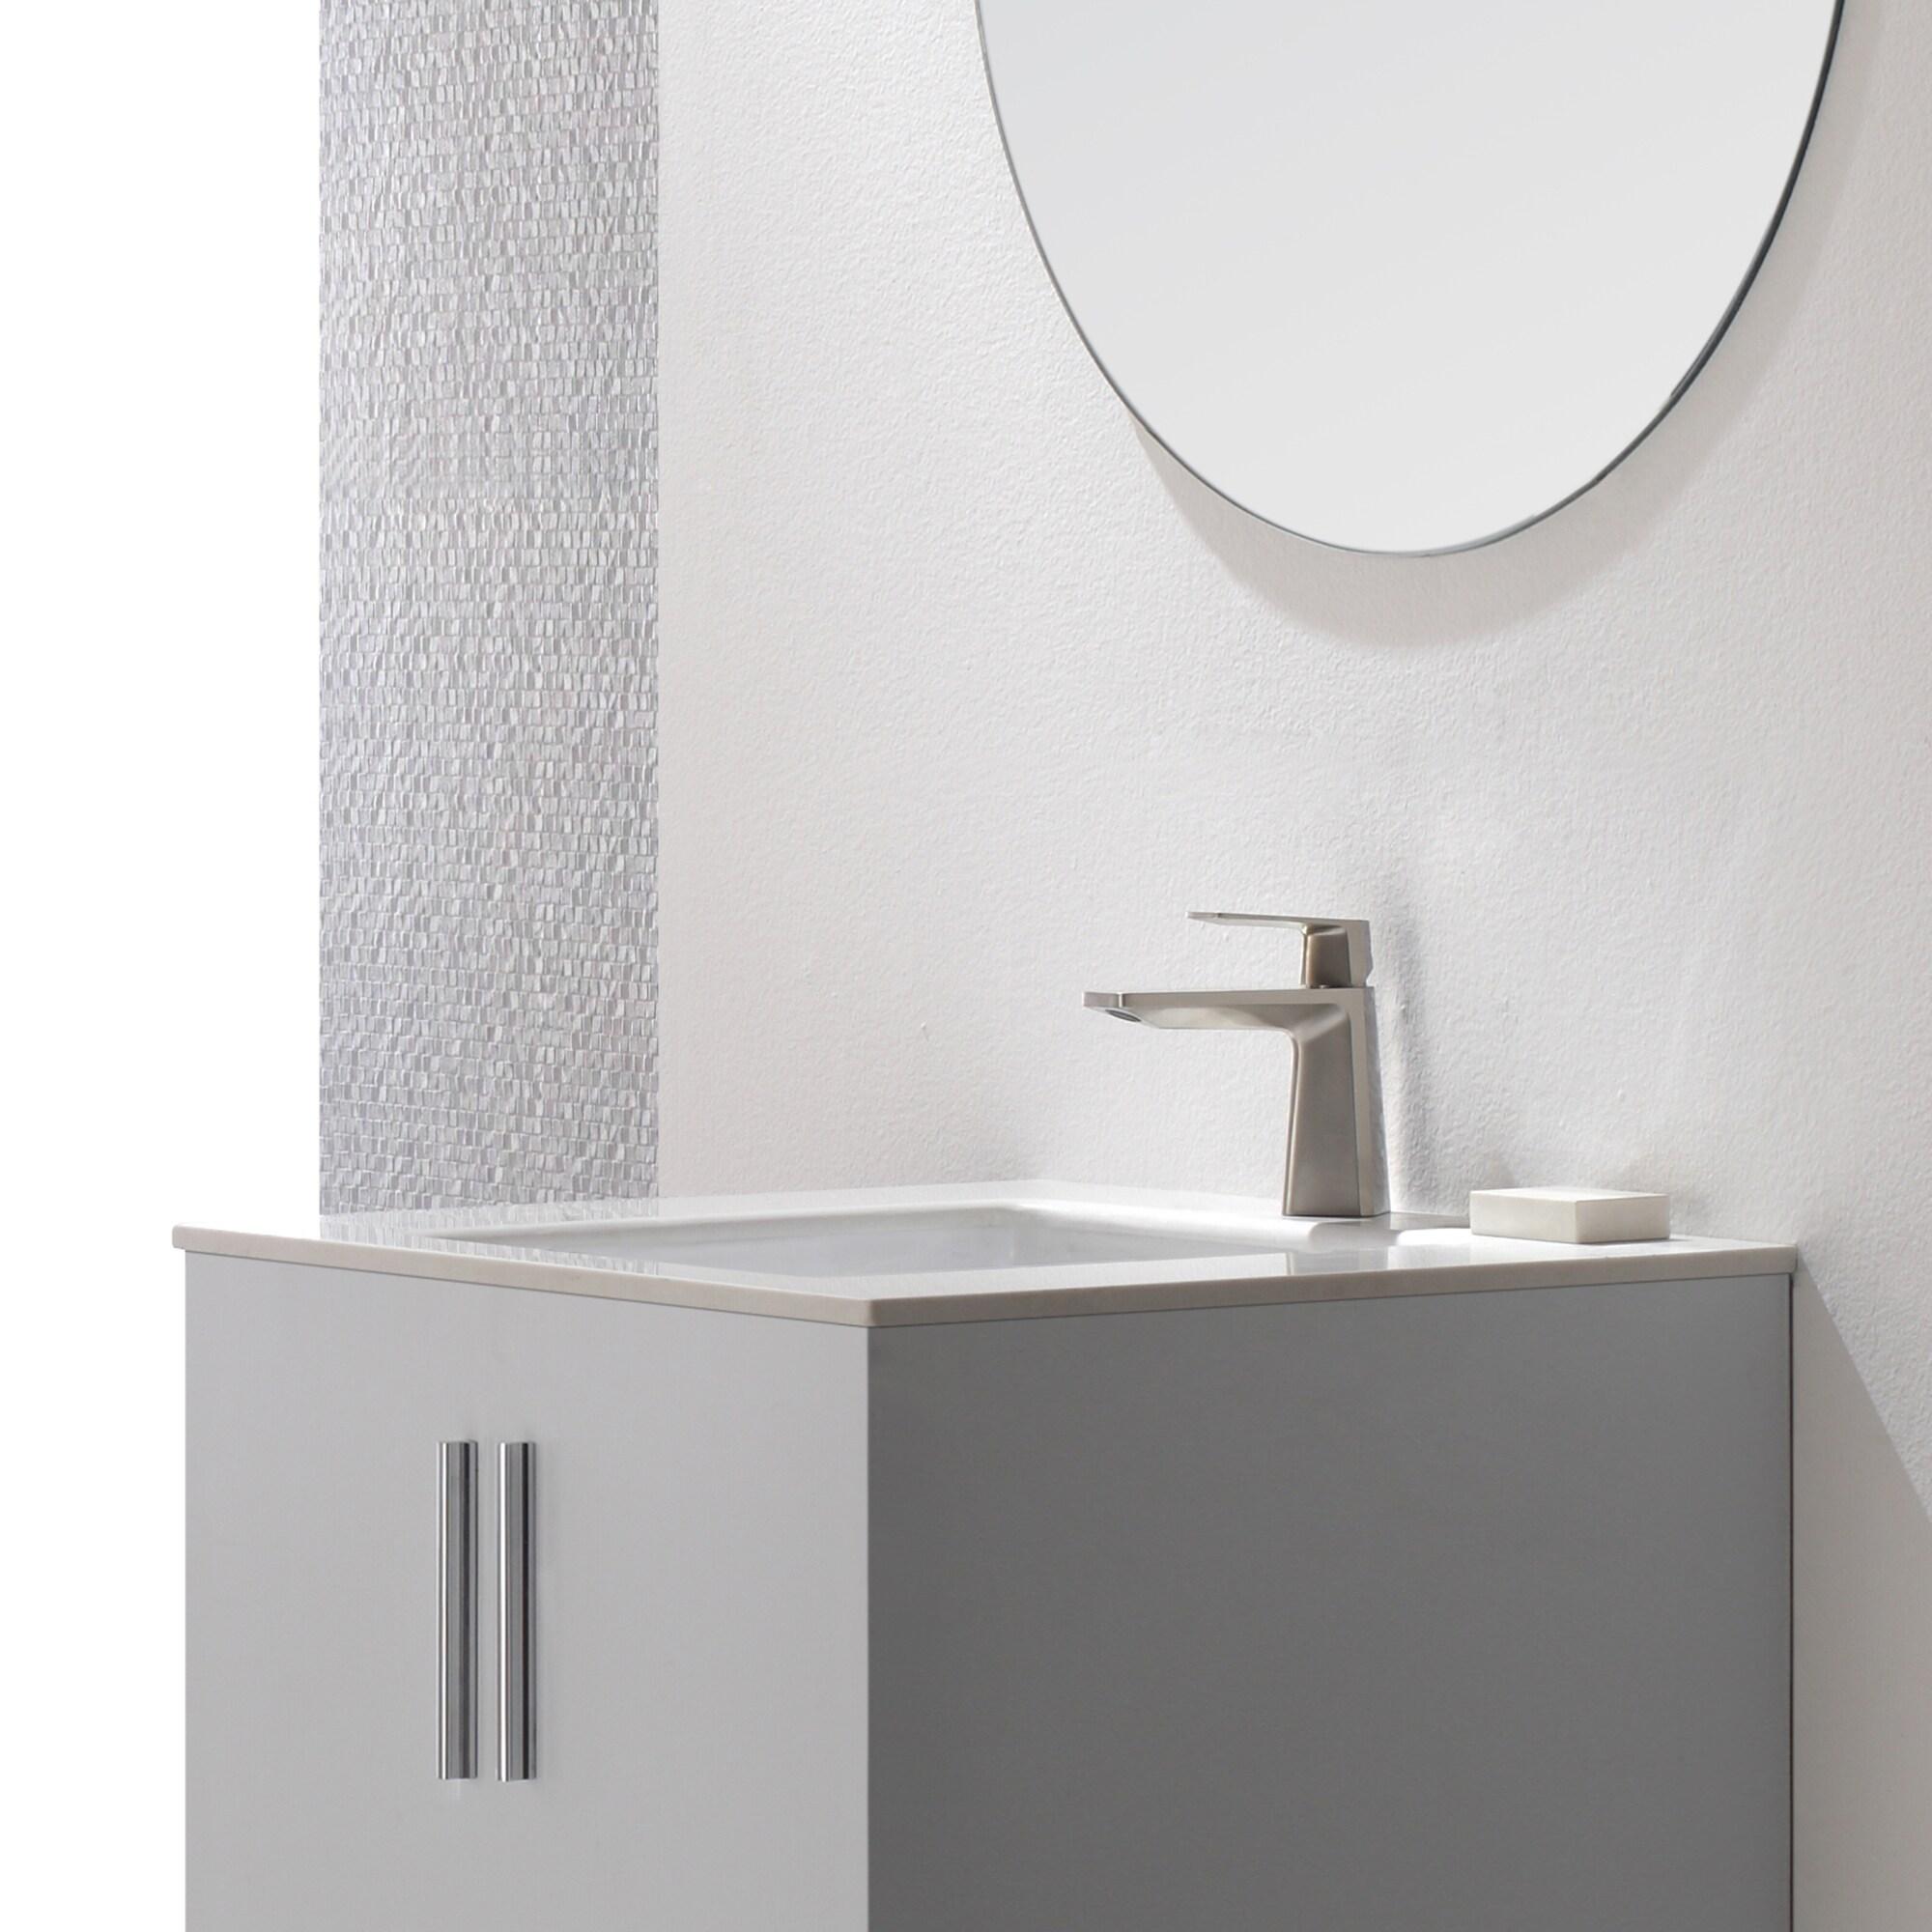 Shop KRAUS Aplos Single Hole Single-Handle Bathroom Faucet - Free ...